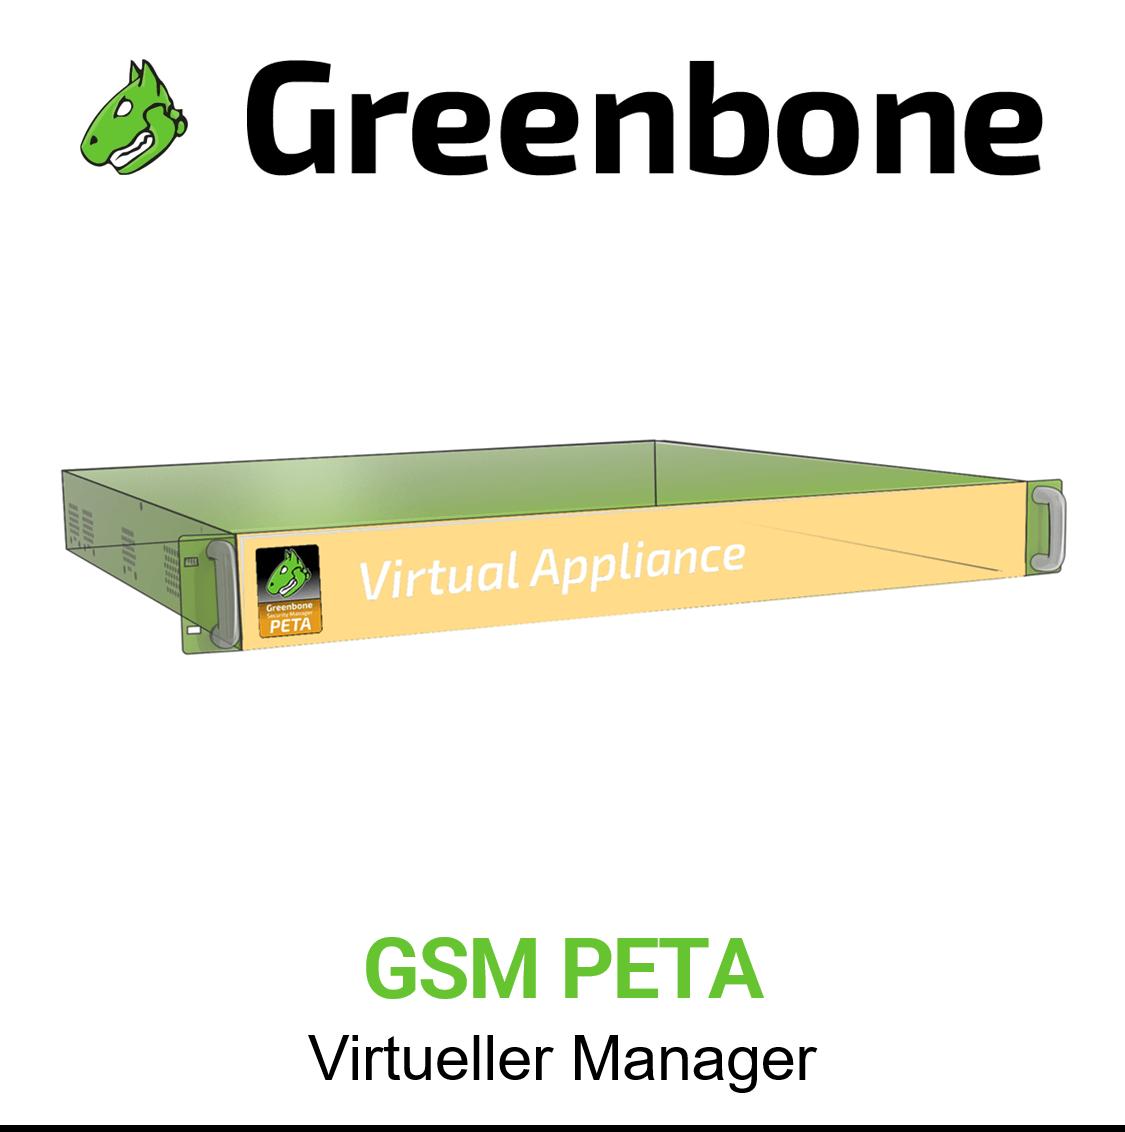 Greenbone GSM PETA Virtuelle Appliance